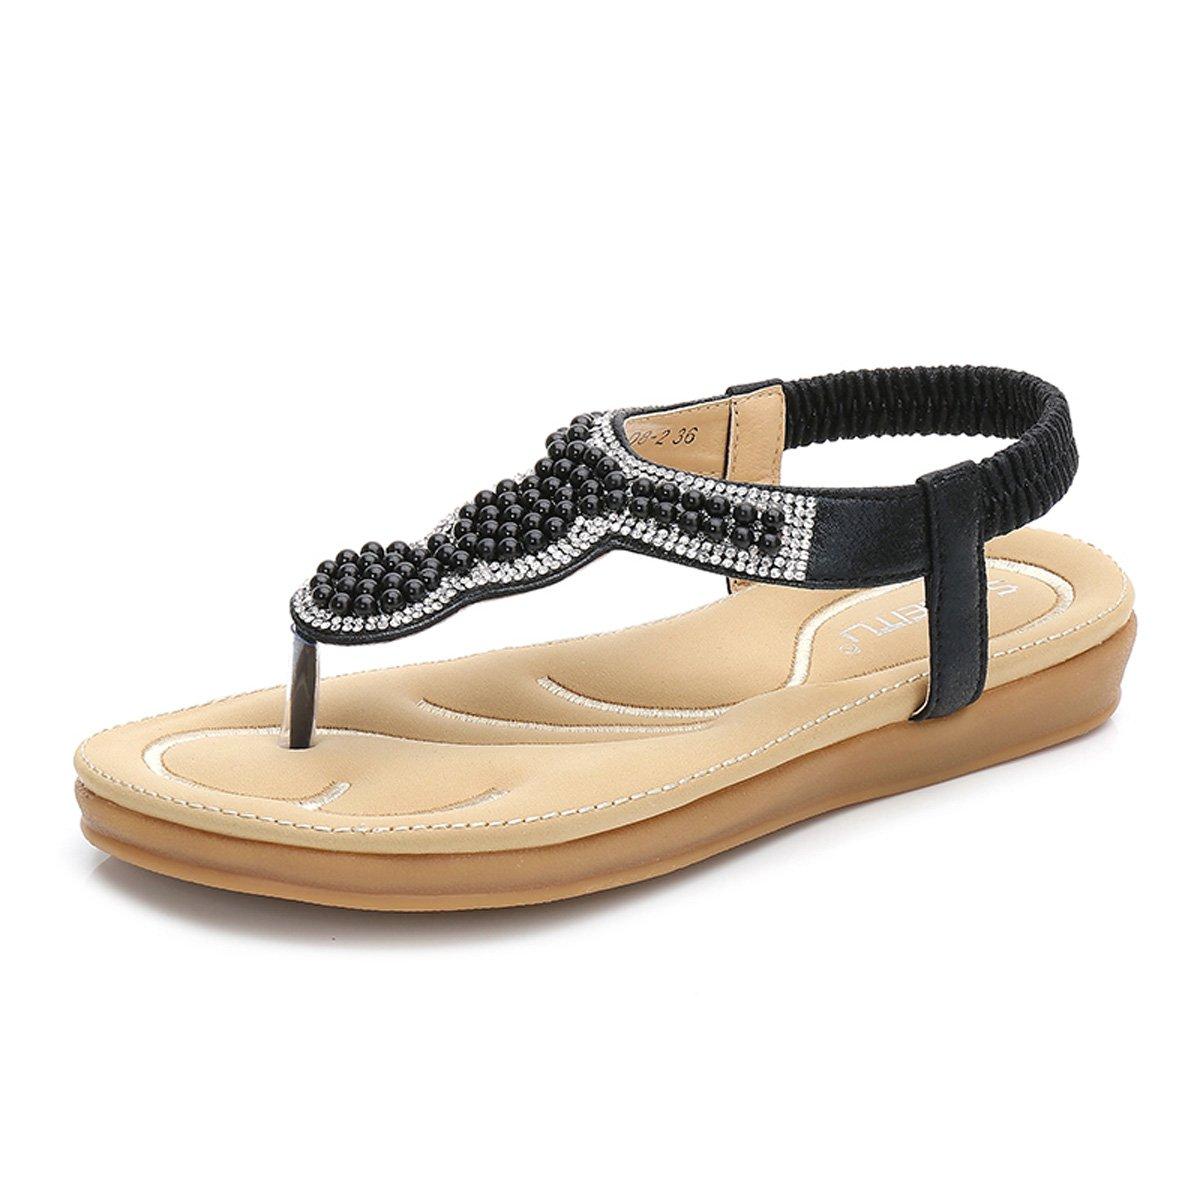 gracosy Damen Sandalen, Flip Flops Sommer Sandals Flach Zehentrenner T-Strap Offen Bouml;hmische Strand Schuhe  36 EU Schwarz-a